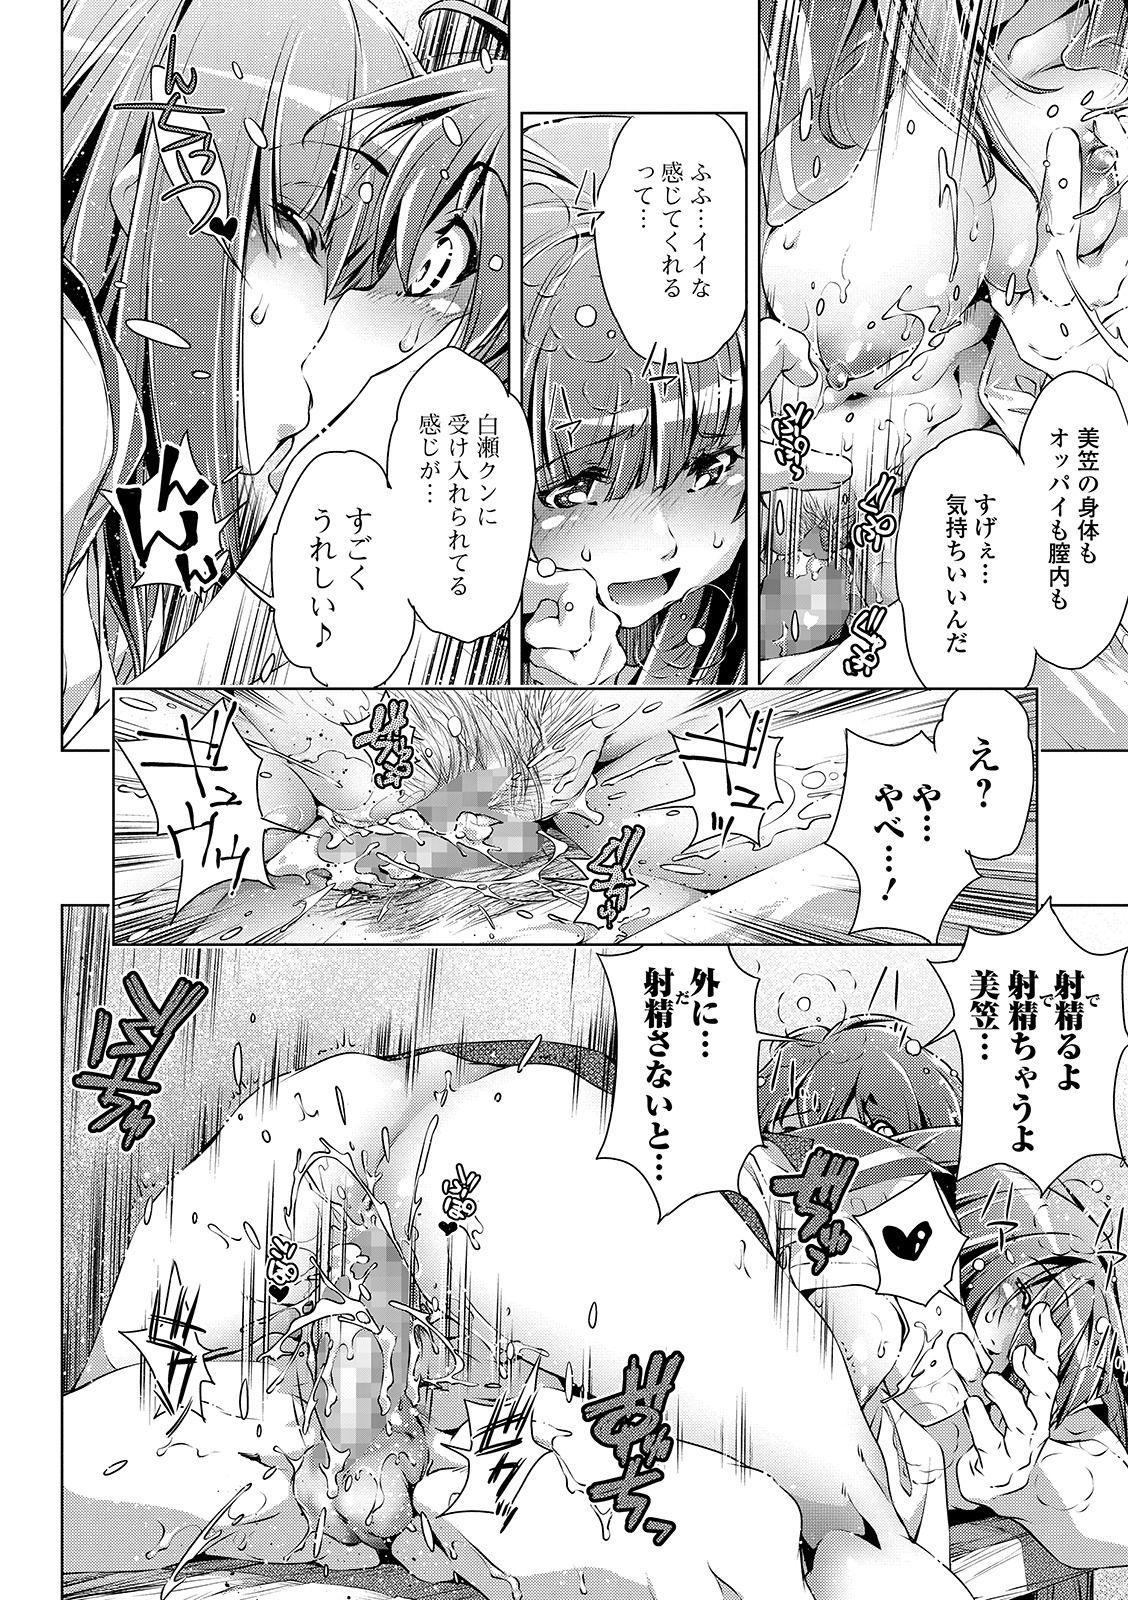 COMIC Shigekiteki SQUIRT!! Vol. 15 143